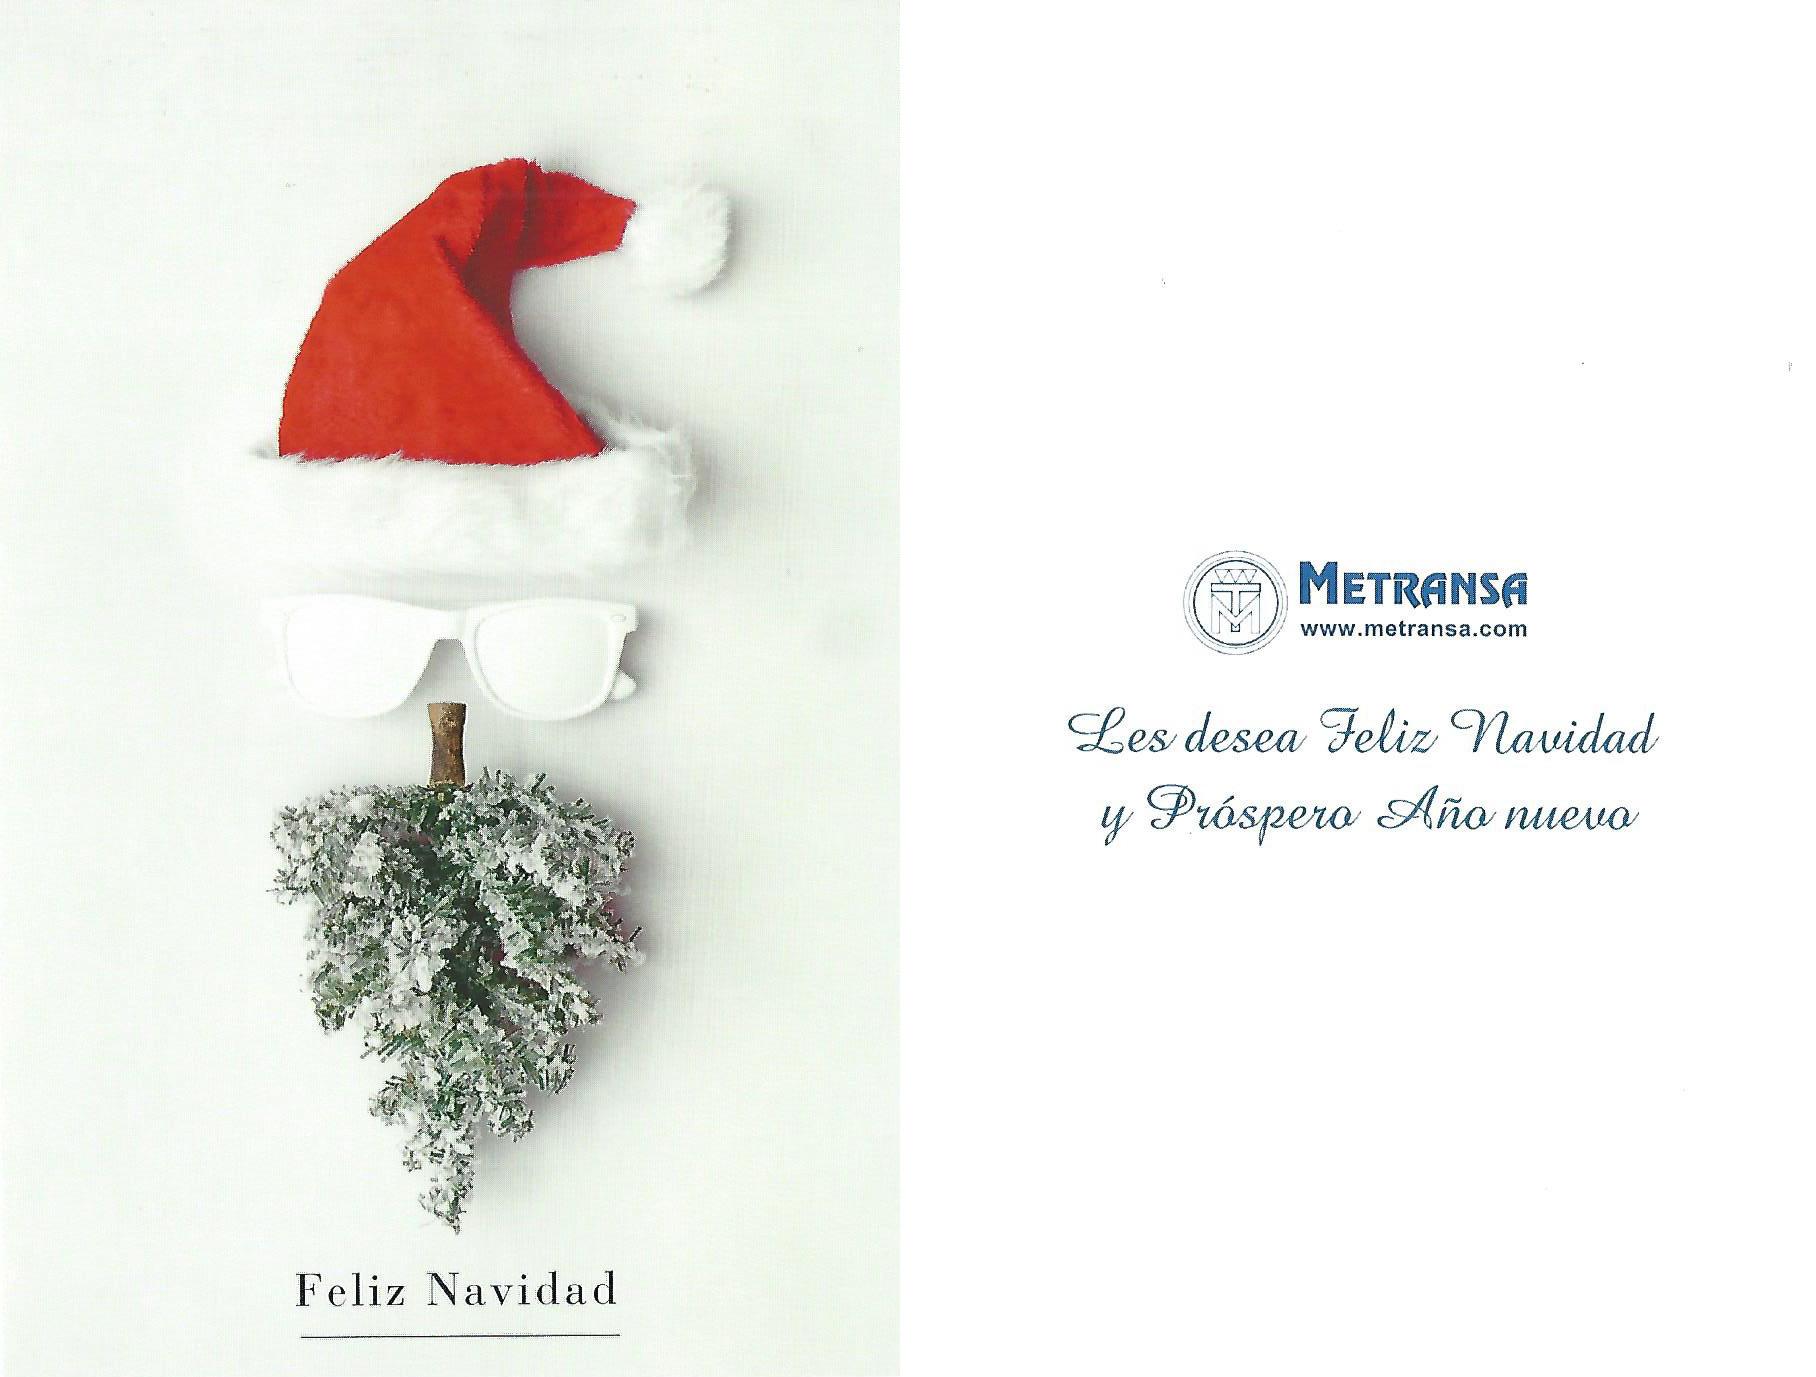 Felicitación Navidad Metransa